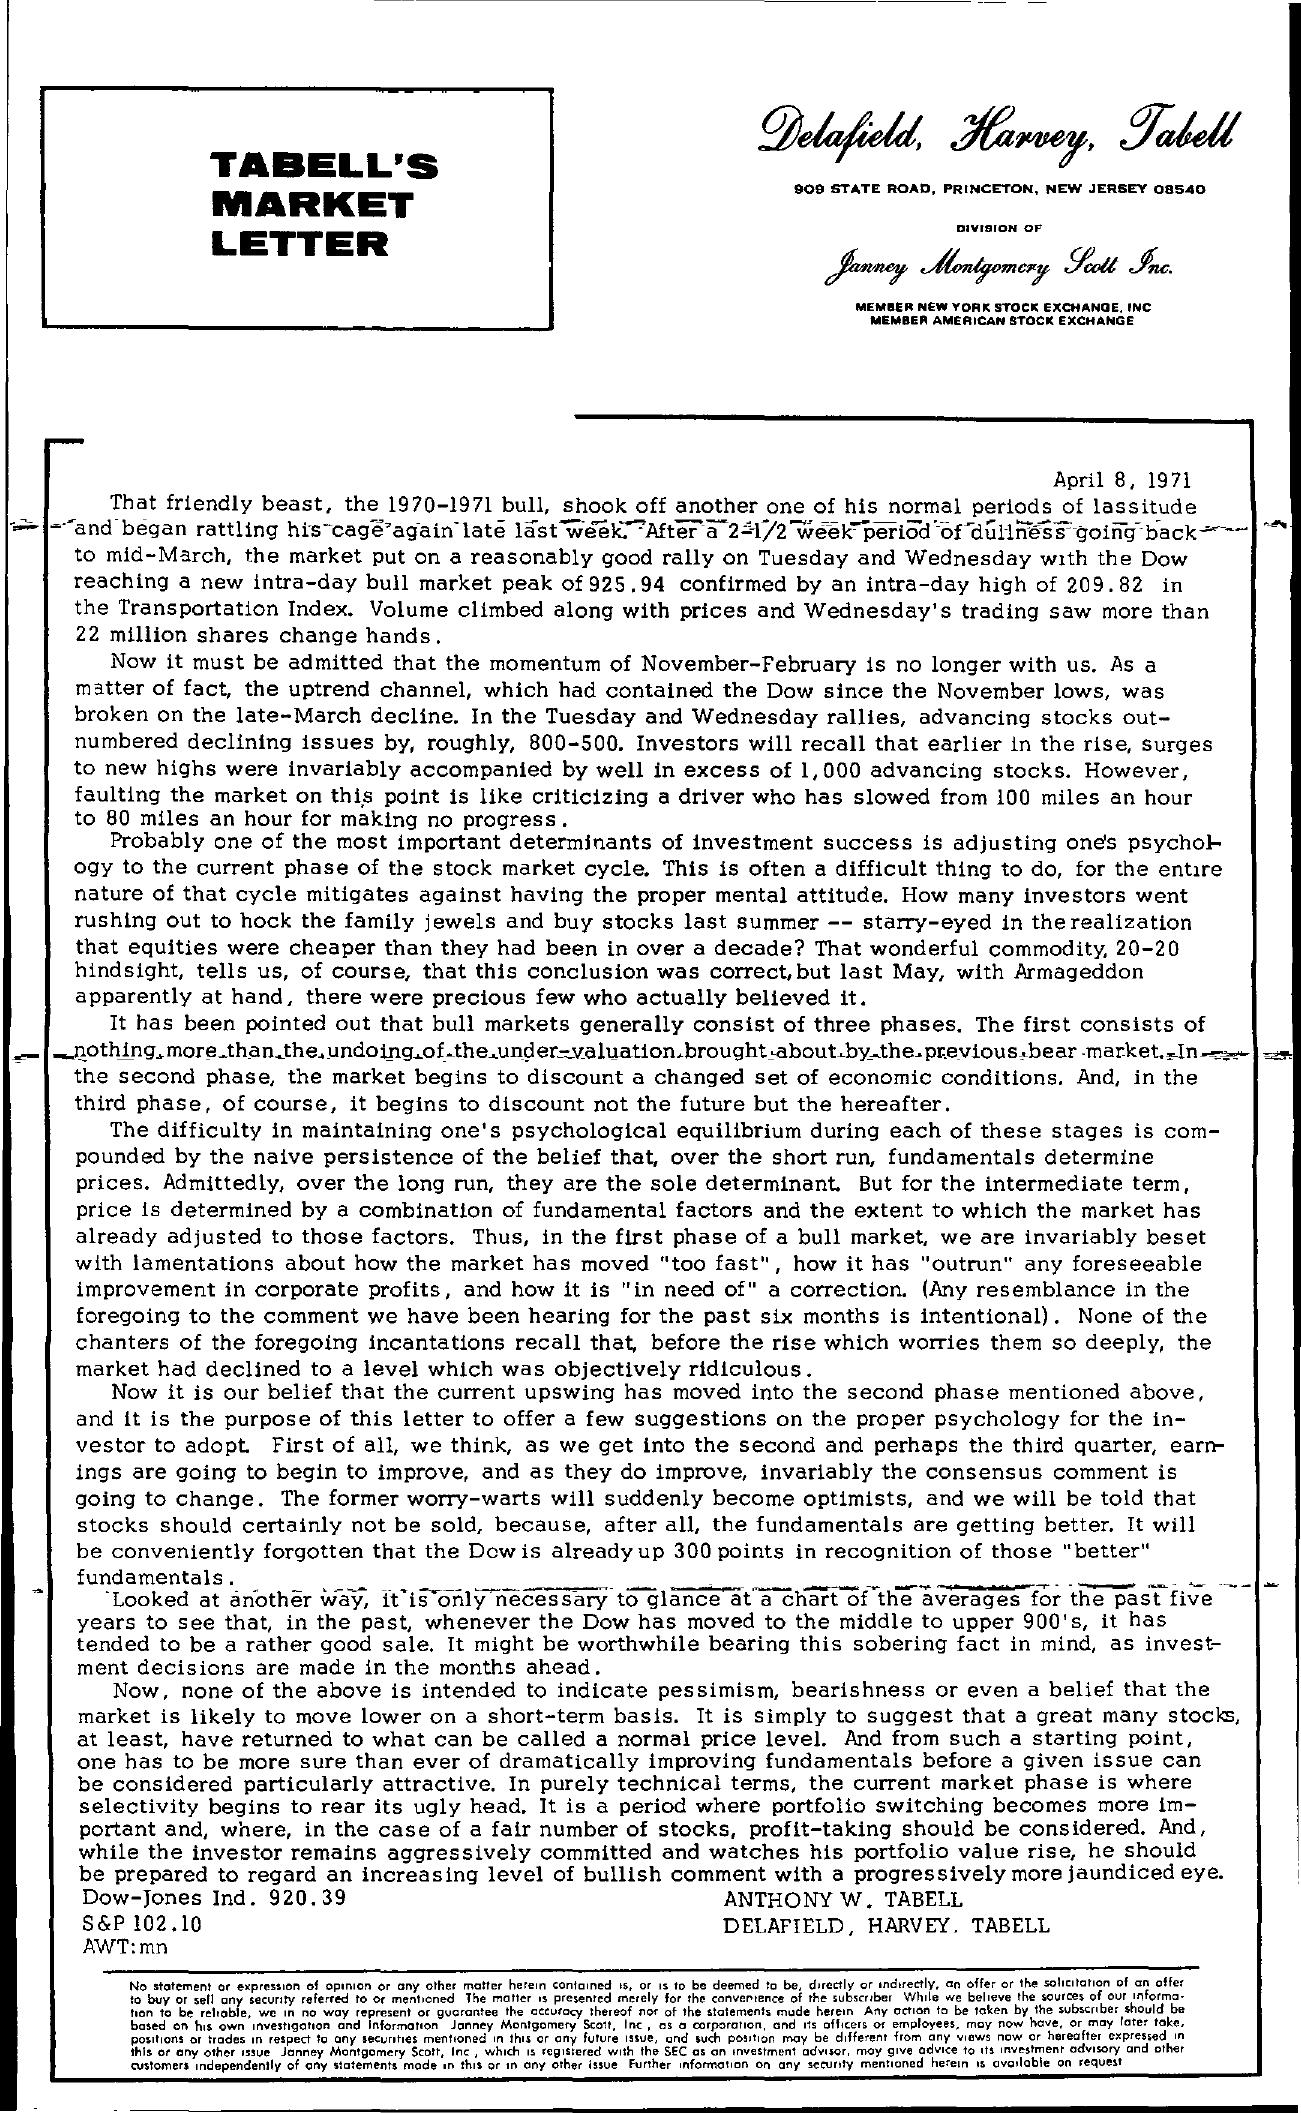 Tabell's Market Letter - April 08, 1971